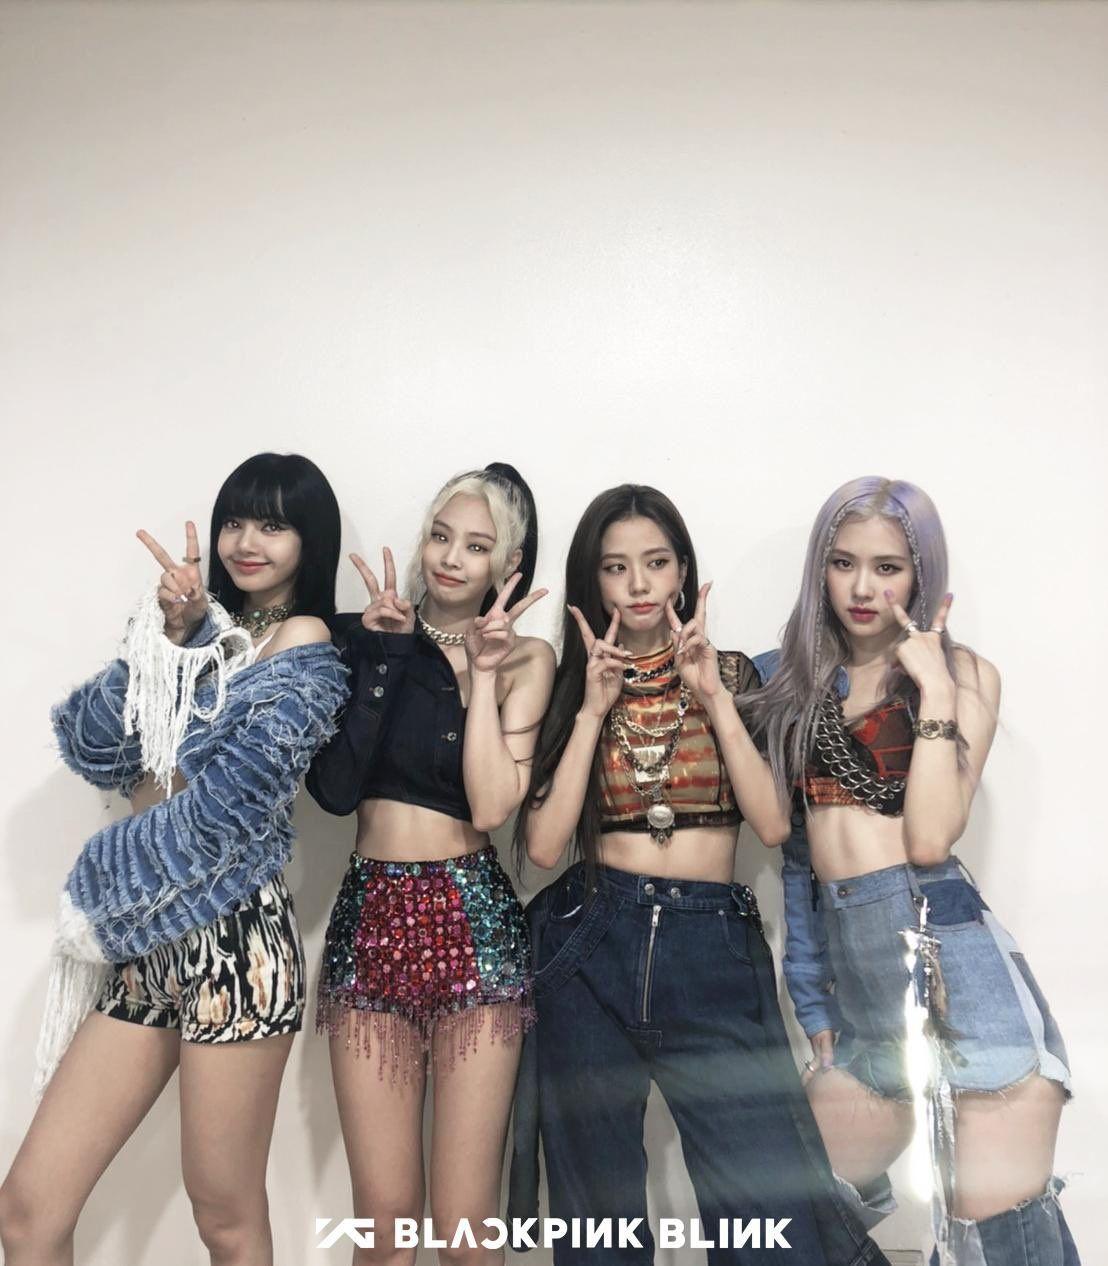 Https Blackpinkupdate Com Wp Content Uploads 2020 06 3 Blackpink How You Like That Sbs Inkigayo 28 June 2020 Jpeg In 2020 Blackpink Fashion Black Pink Women